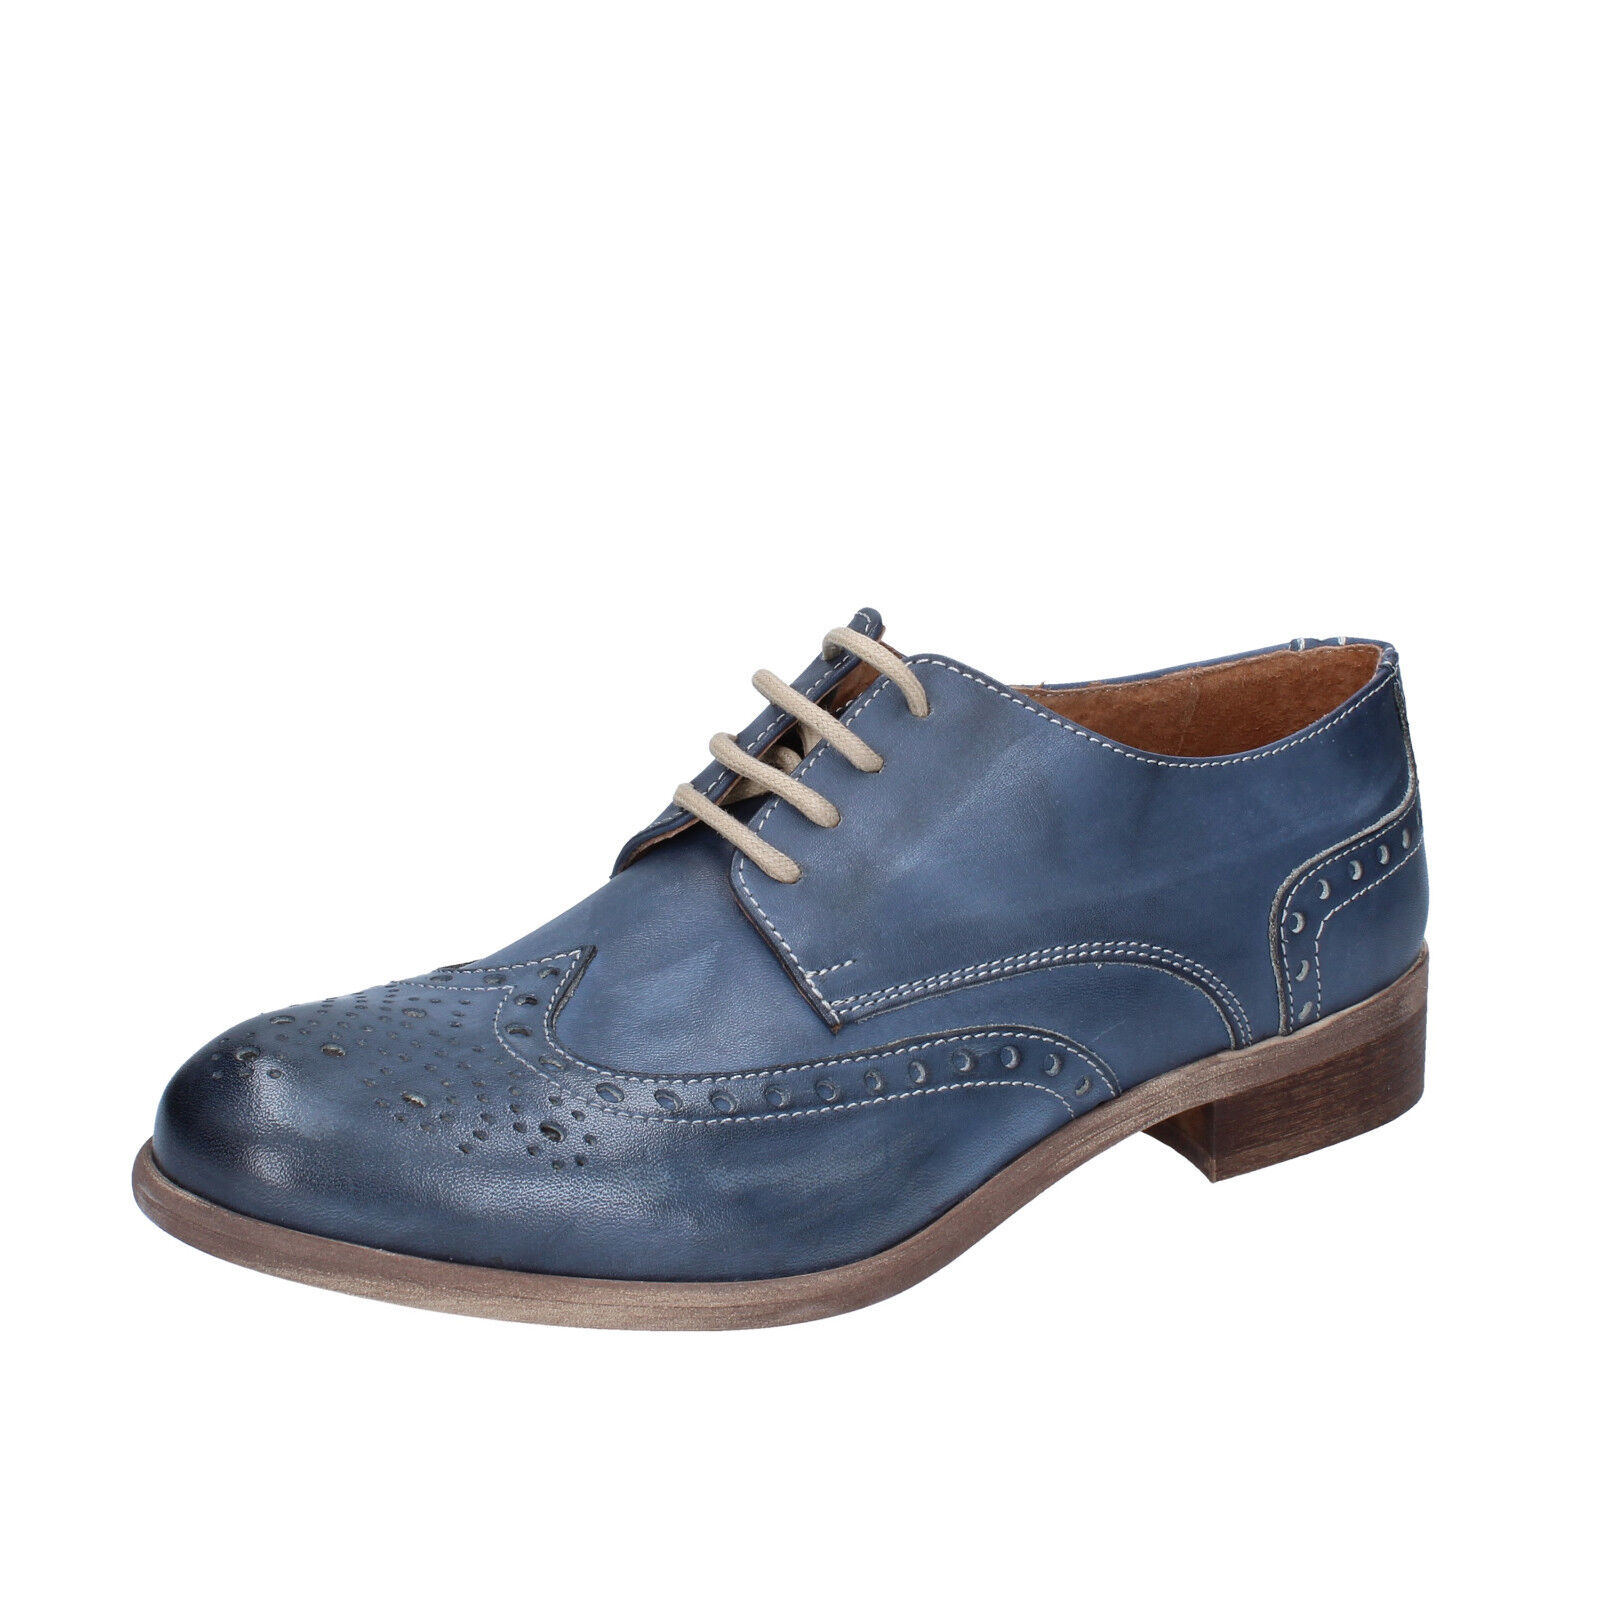 Herren schuhe KEP'S 41 elegante blau leder BZ887-C